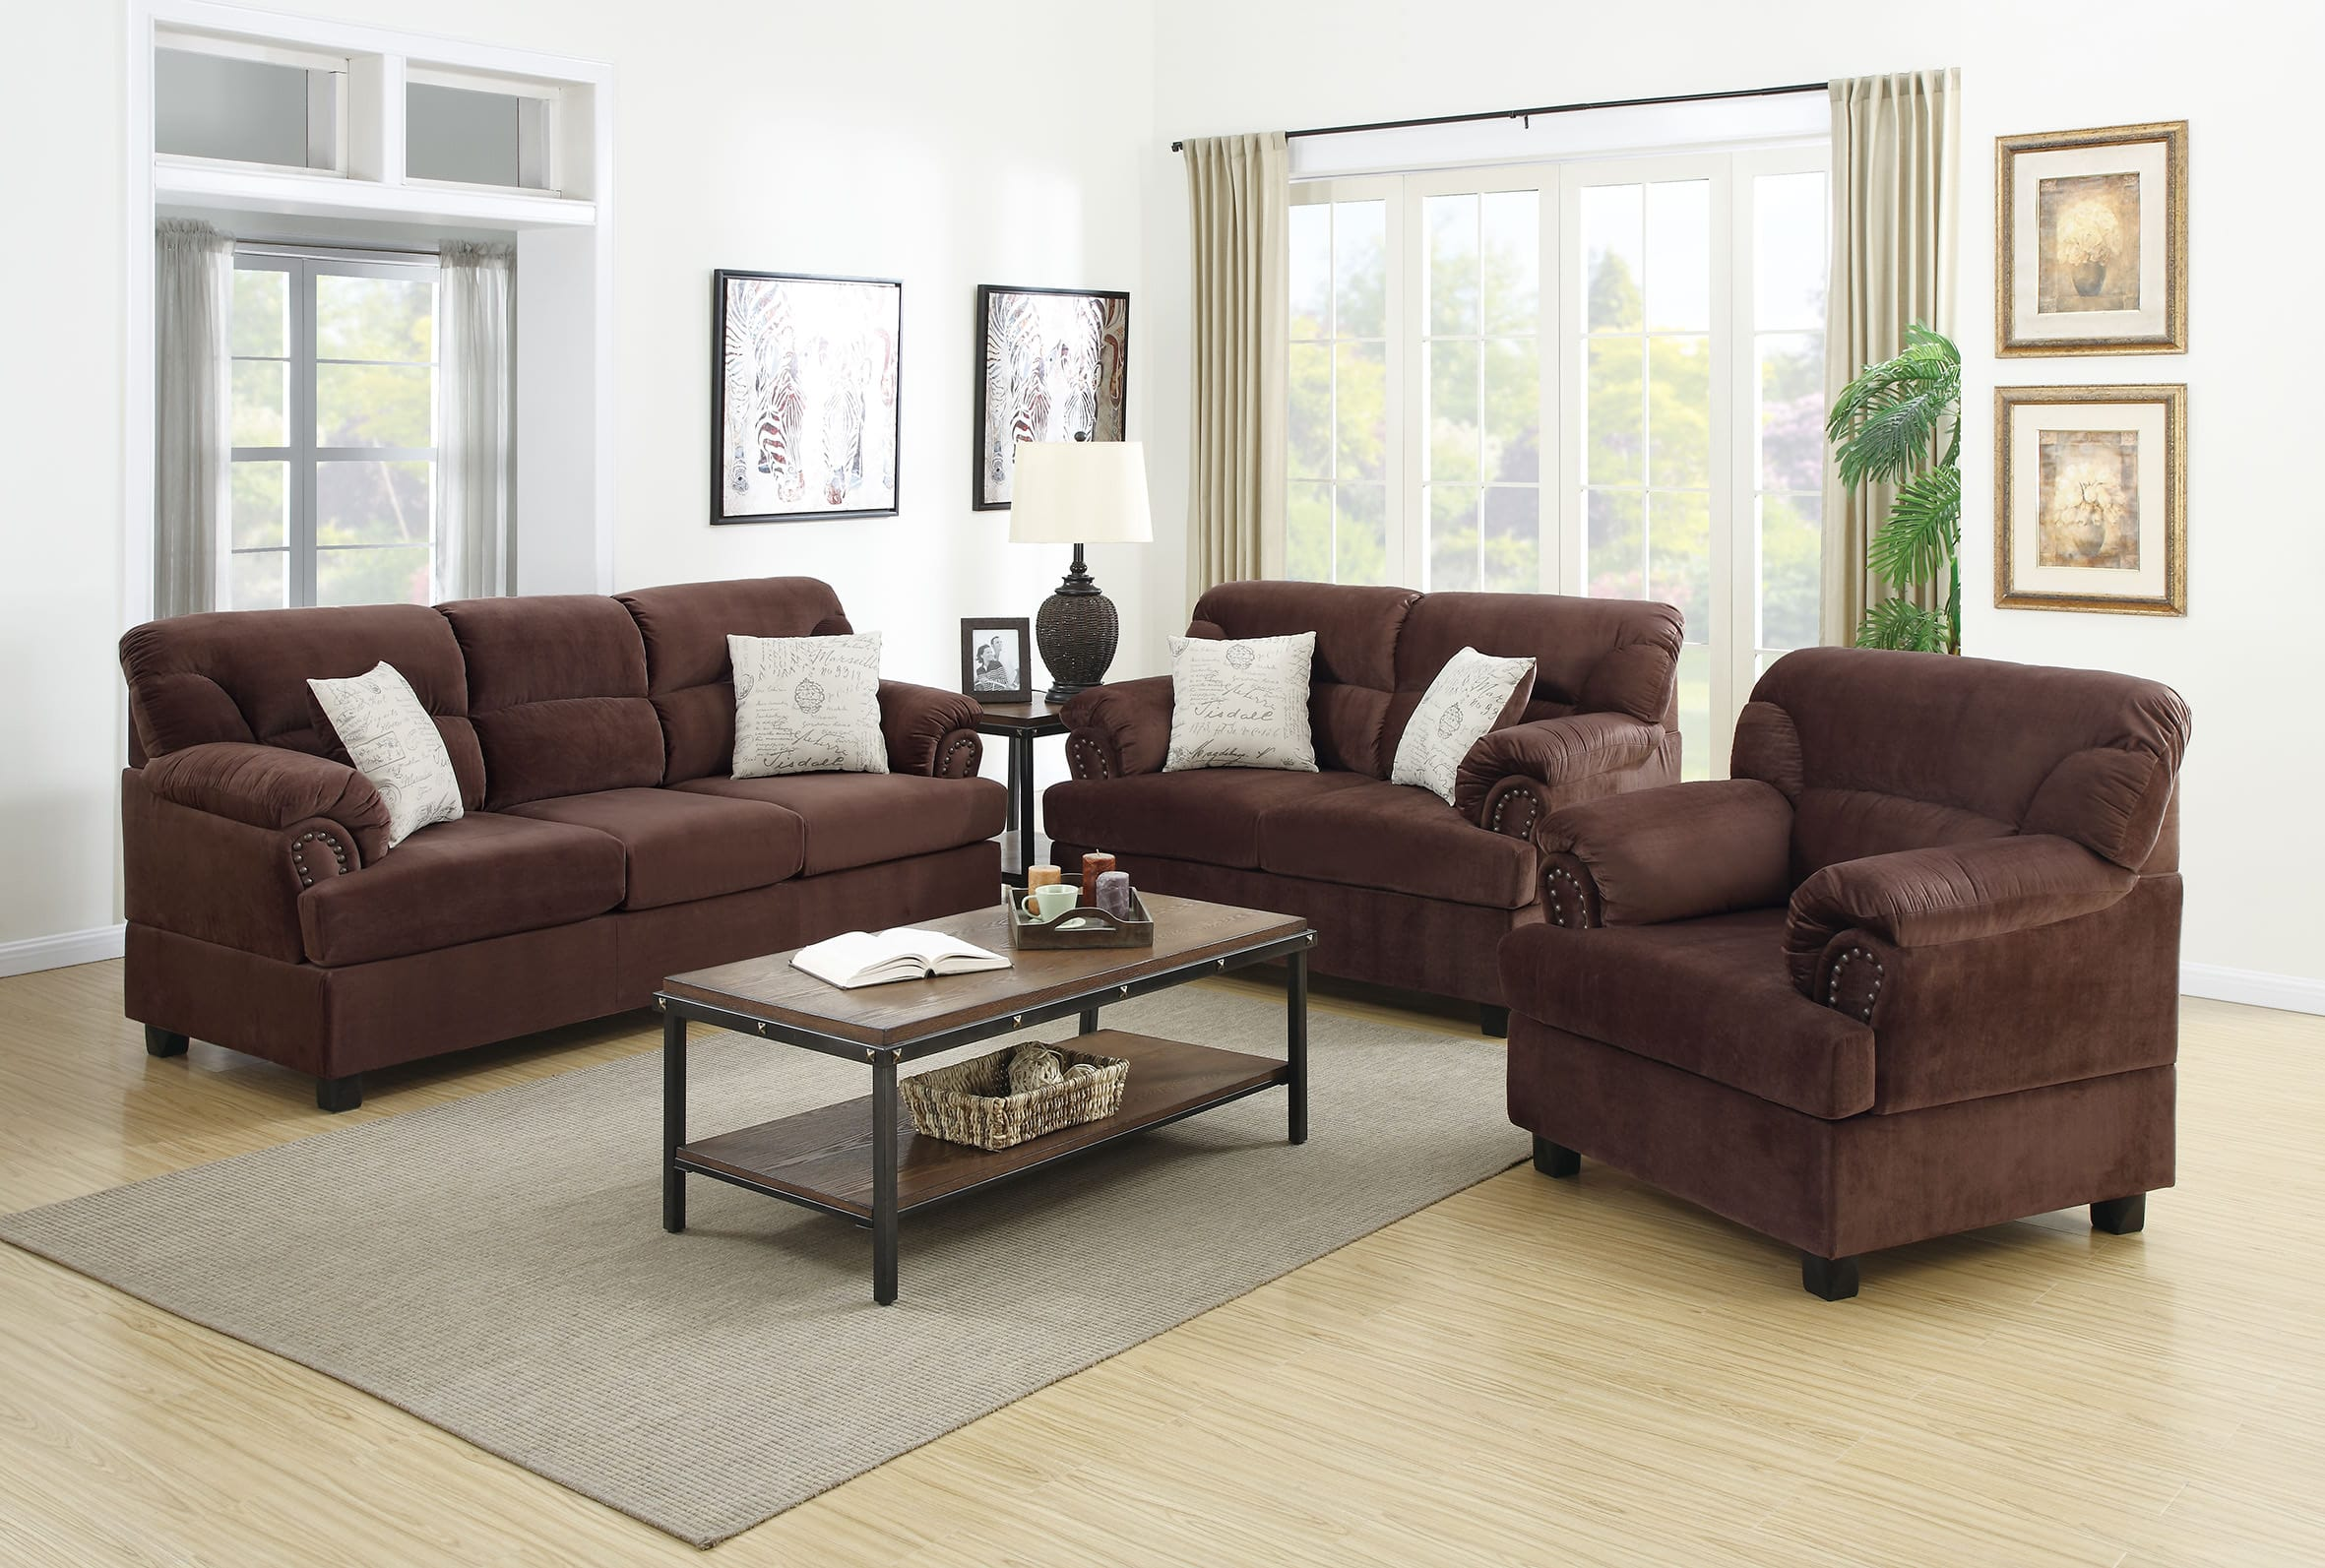 F7915 Chocolate 3 Pcs Sofa Set by Poundex